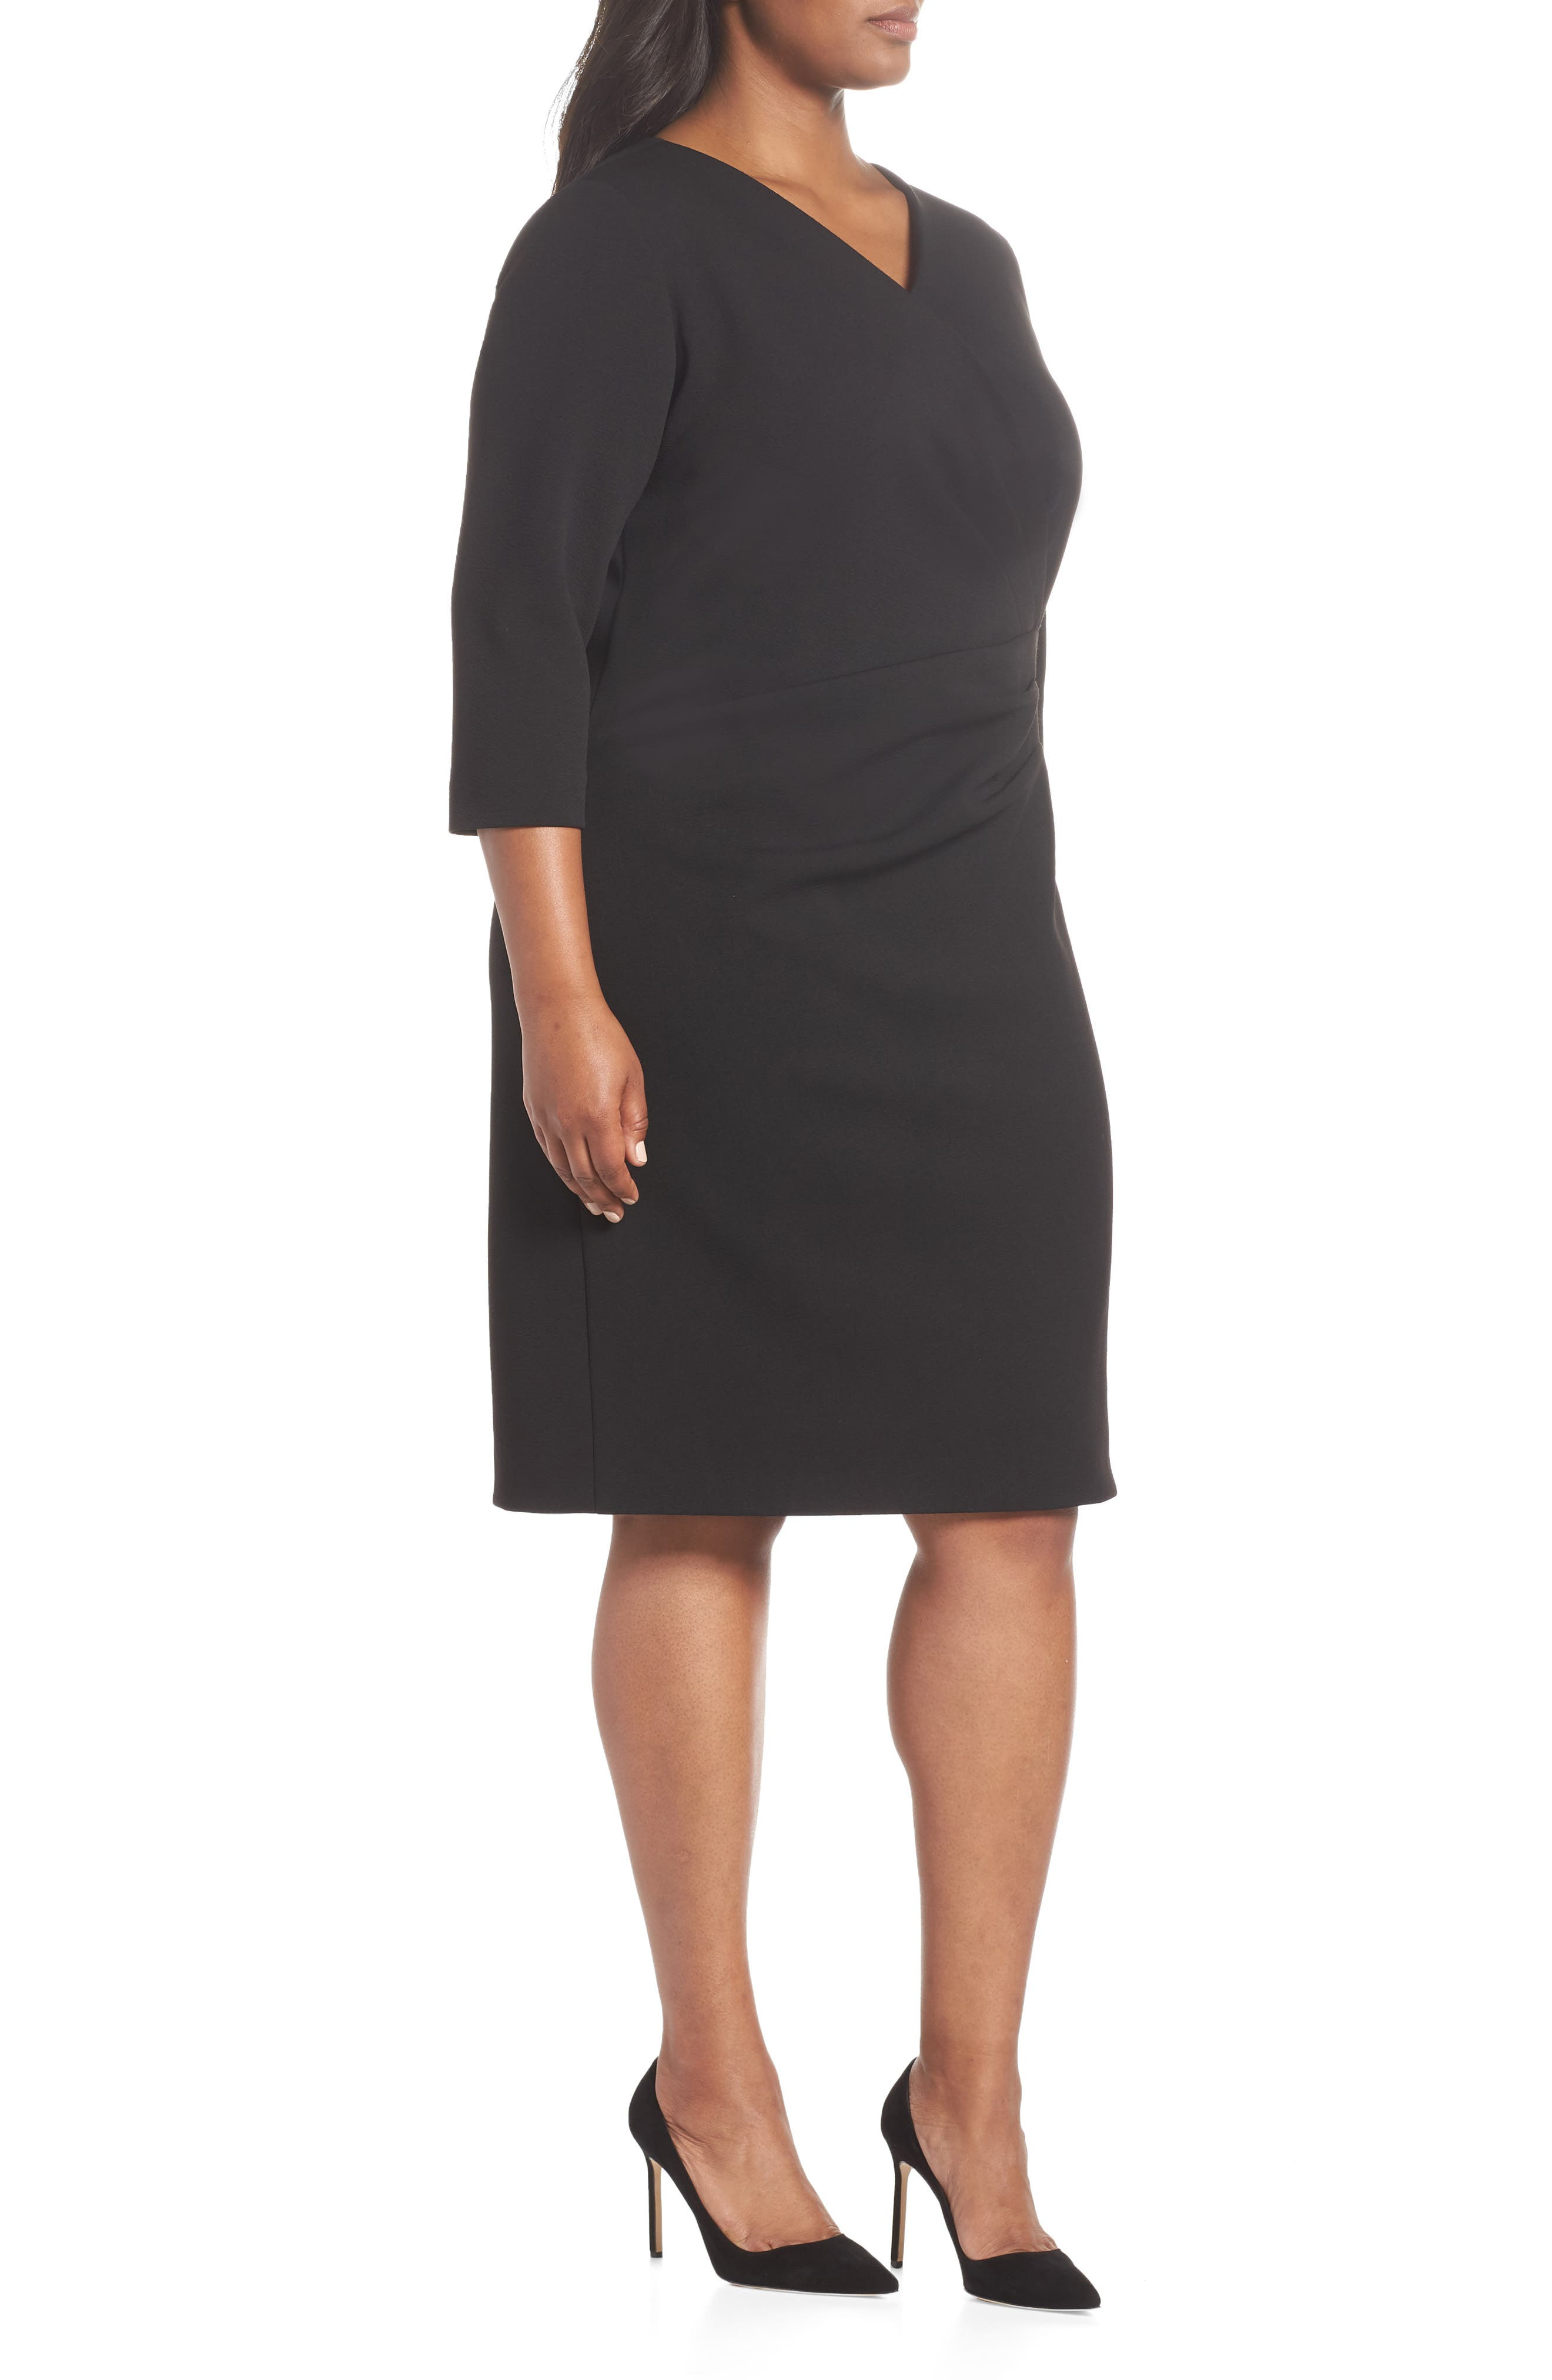 TAHARI, Ruched Surplice Crepe Sheath Dress, Alternate thumbnail 4, color, BLACK